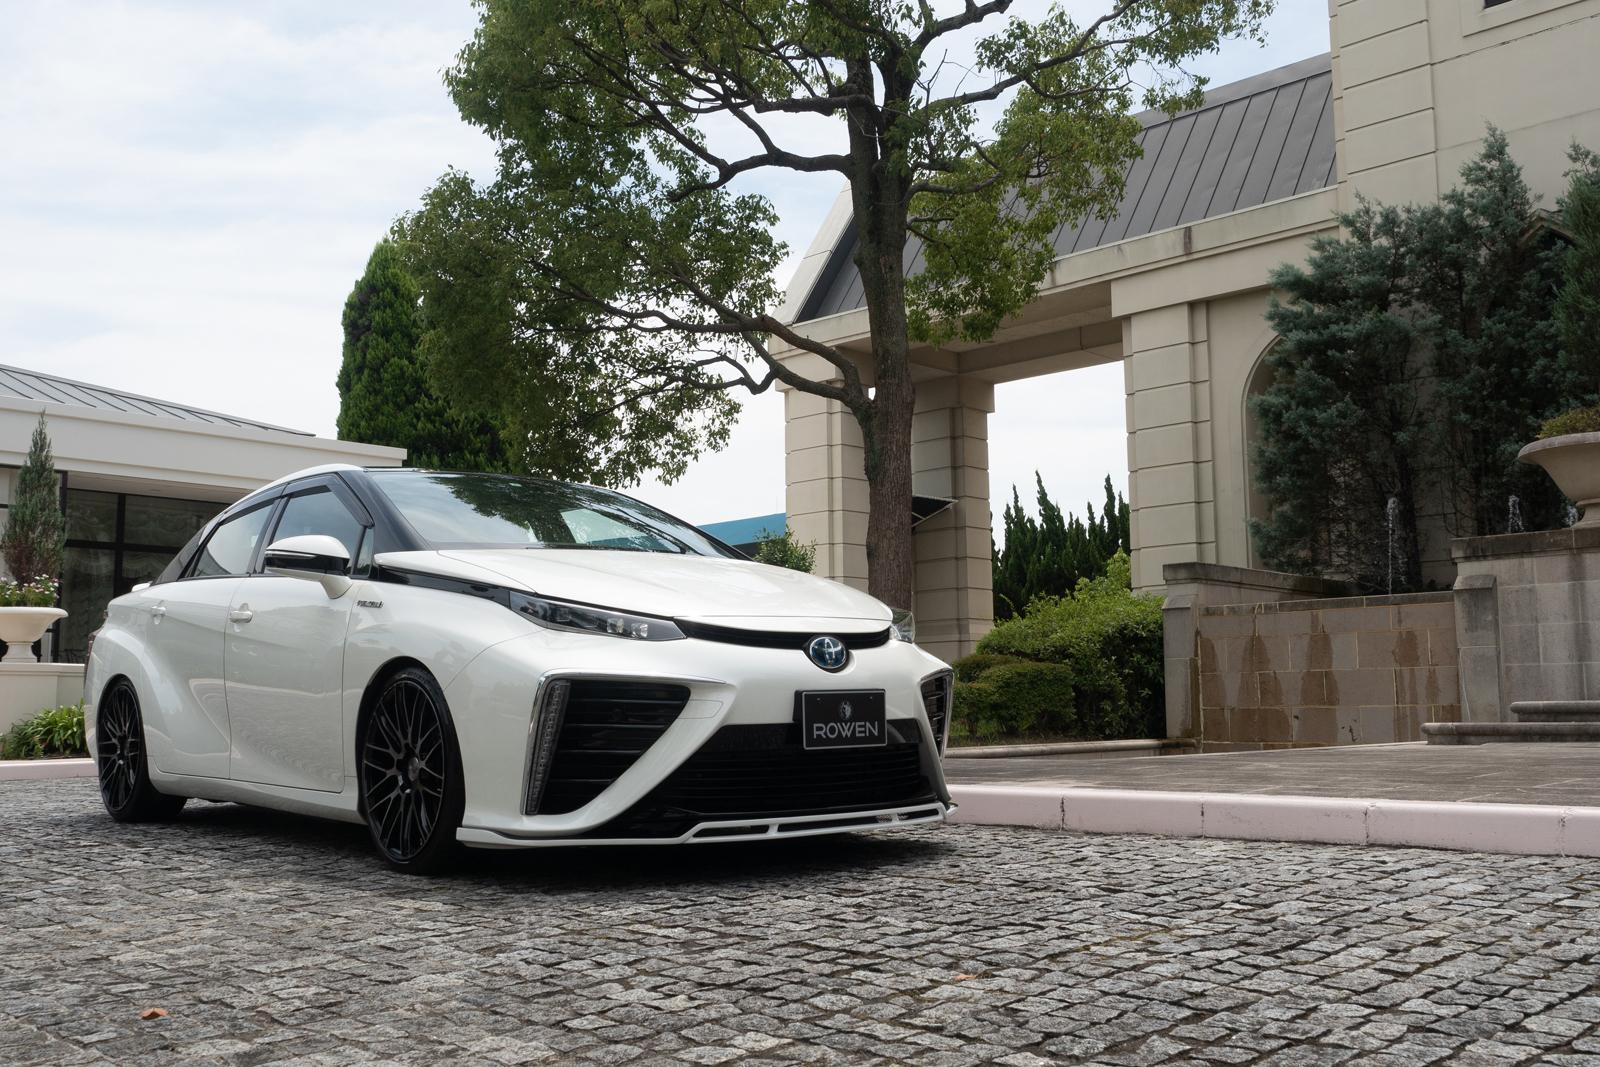 Rowen body kit for Toyota MIRAI JPD10 new style